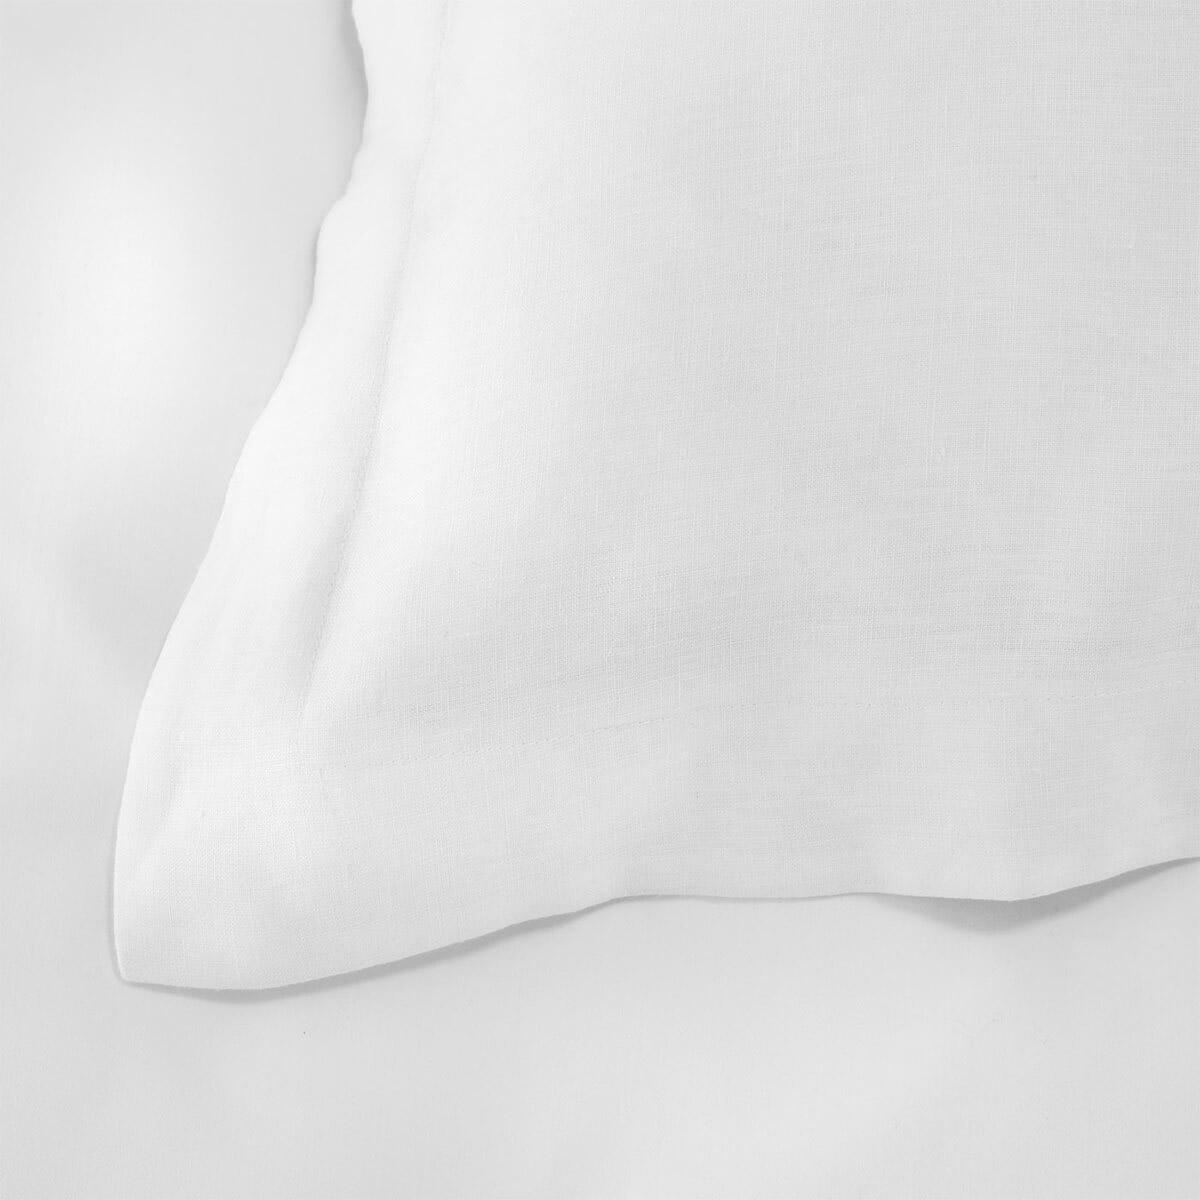 White French Linen Square Oxford Pillowcase Pair